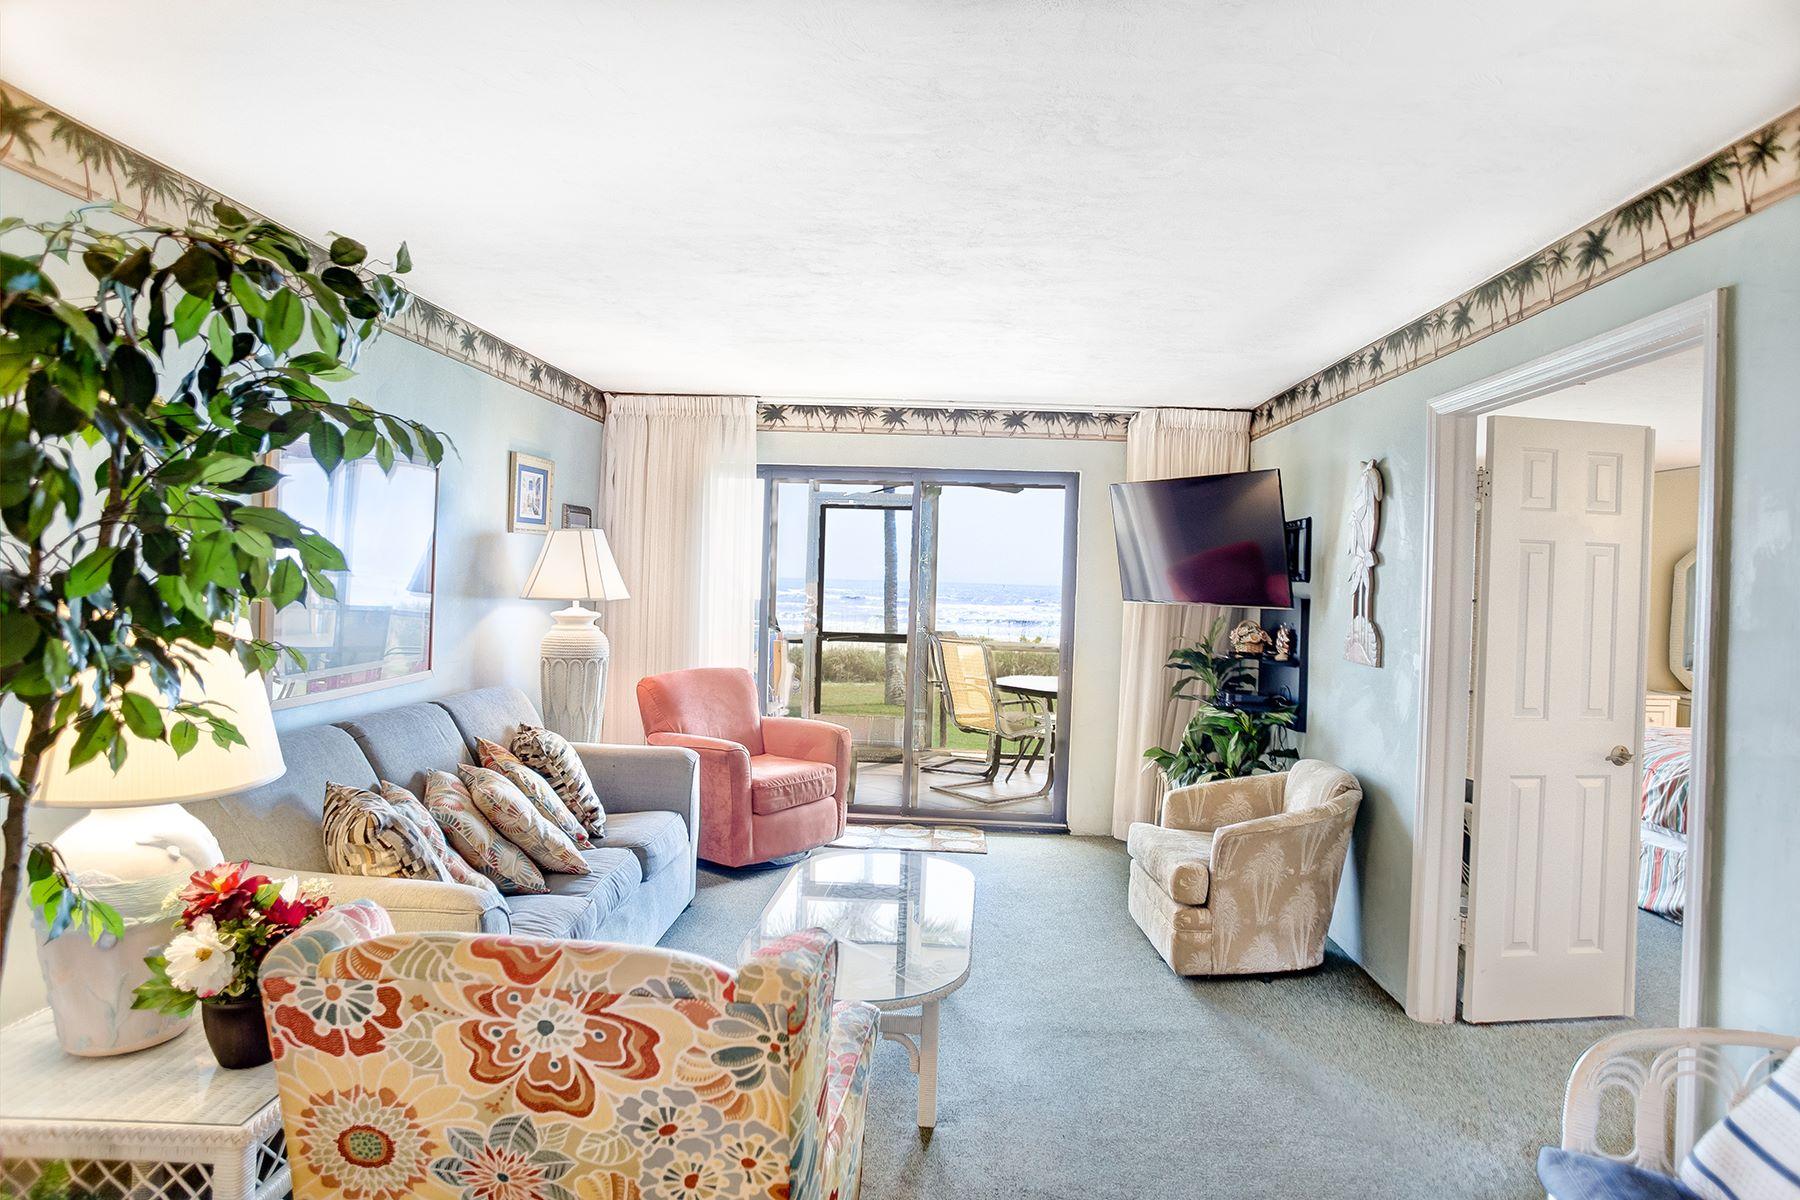 Condominium for Sale at SANIBEL 2445 W Gulf Dr E6 Sanibel, Florida, 33957 United States